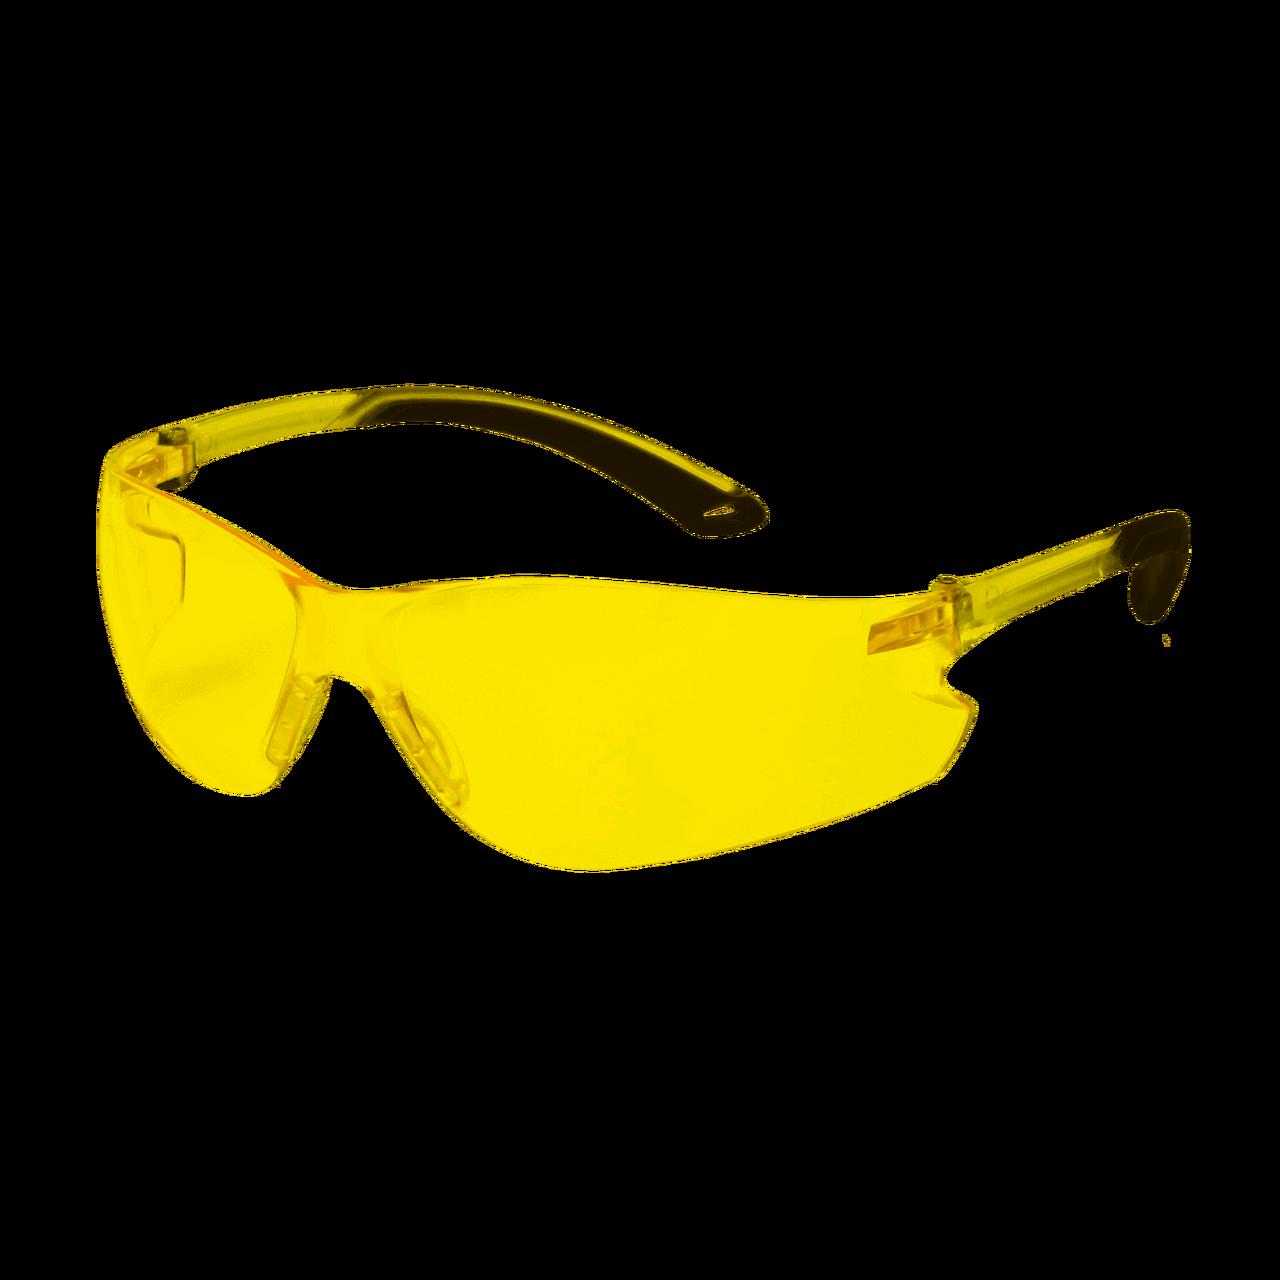 af763a98f933 ... Pyramex ITEK Safety Glasses